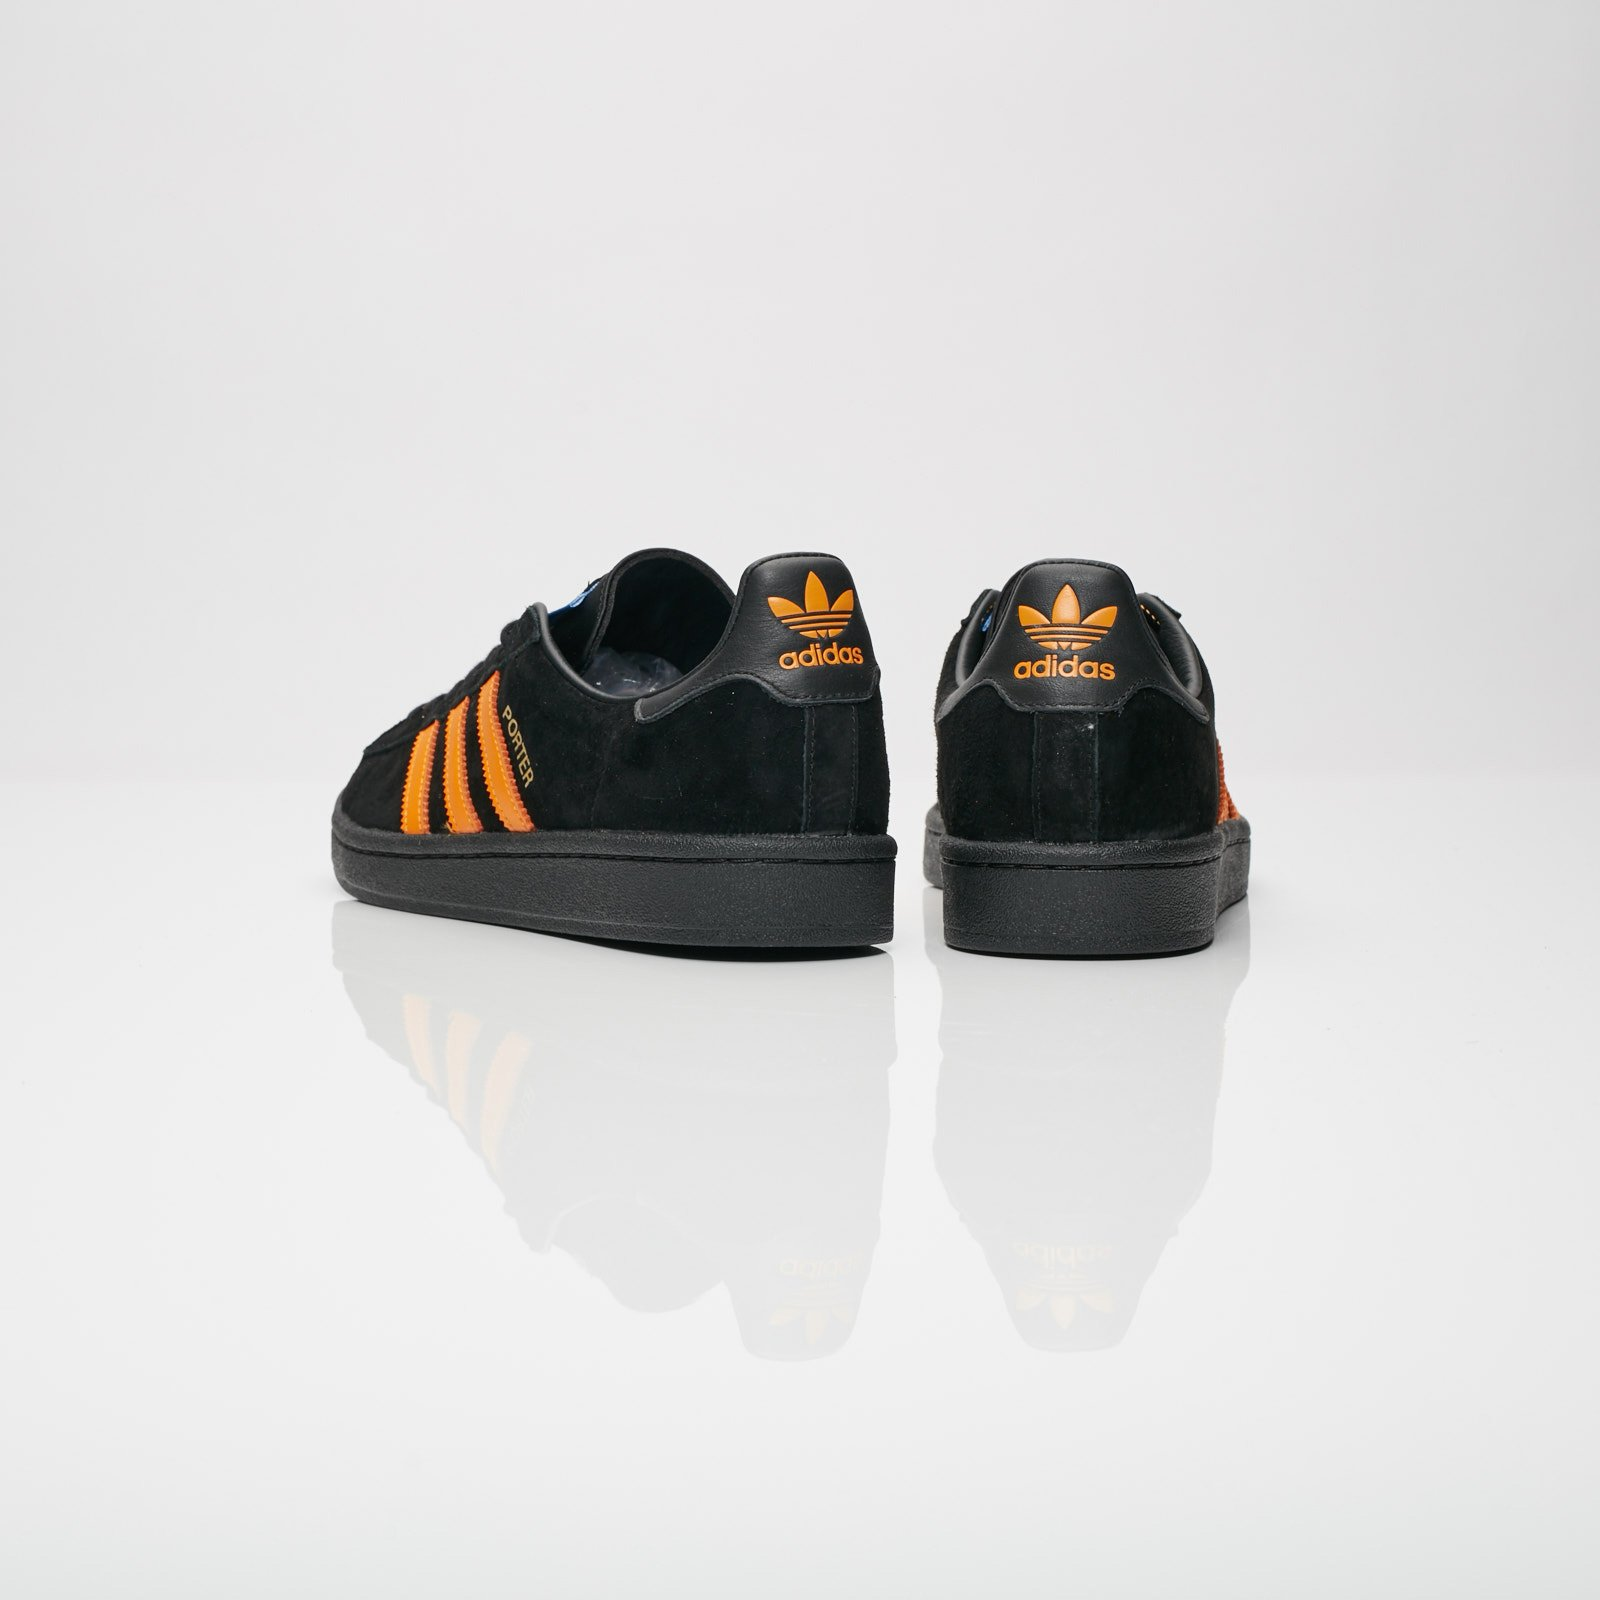 adidas Campus x Porter B28143 Sneakersnstuff | sneakers